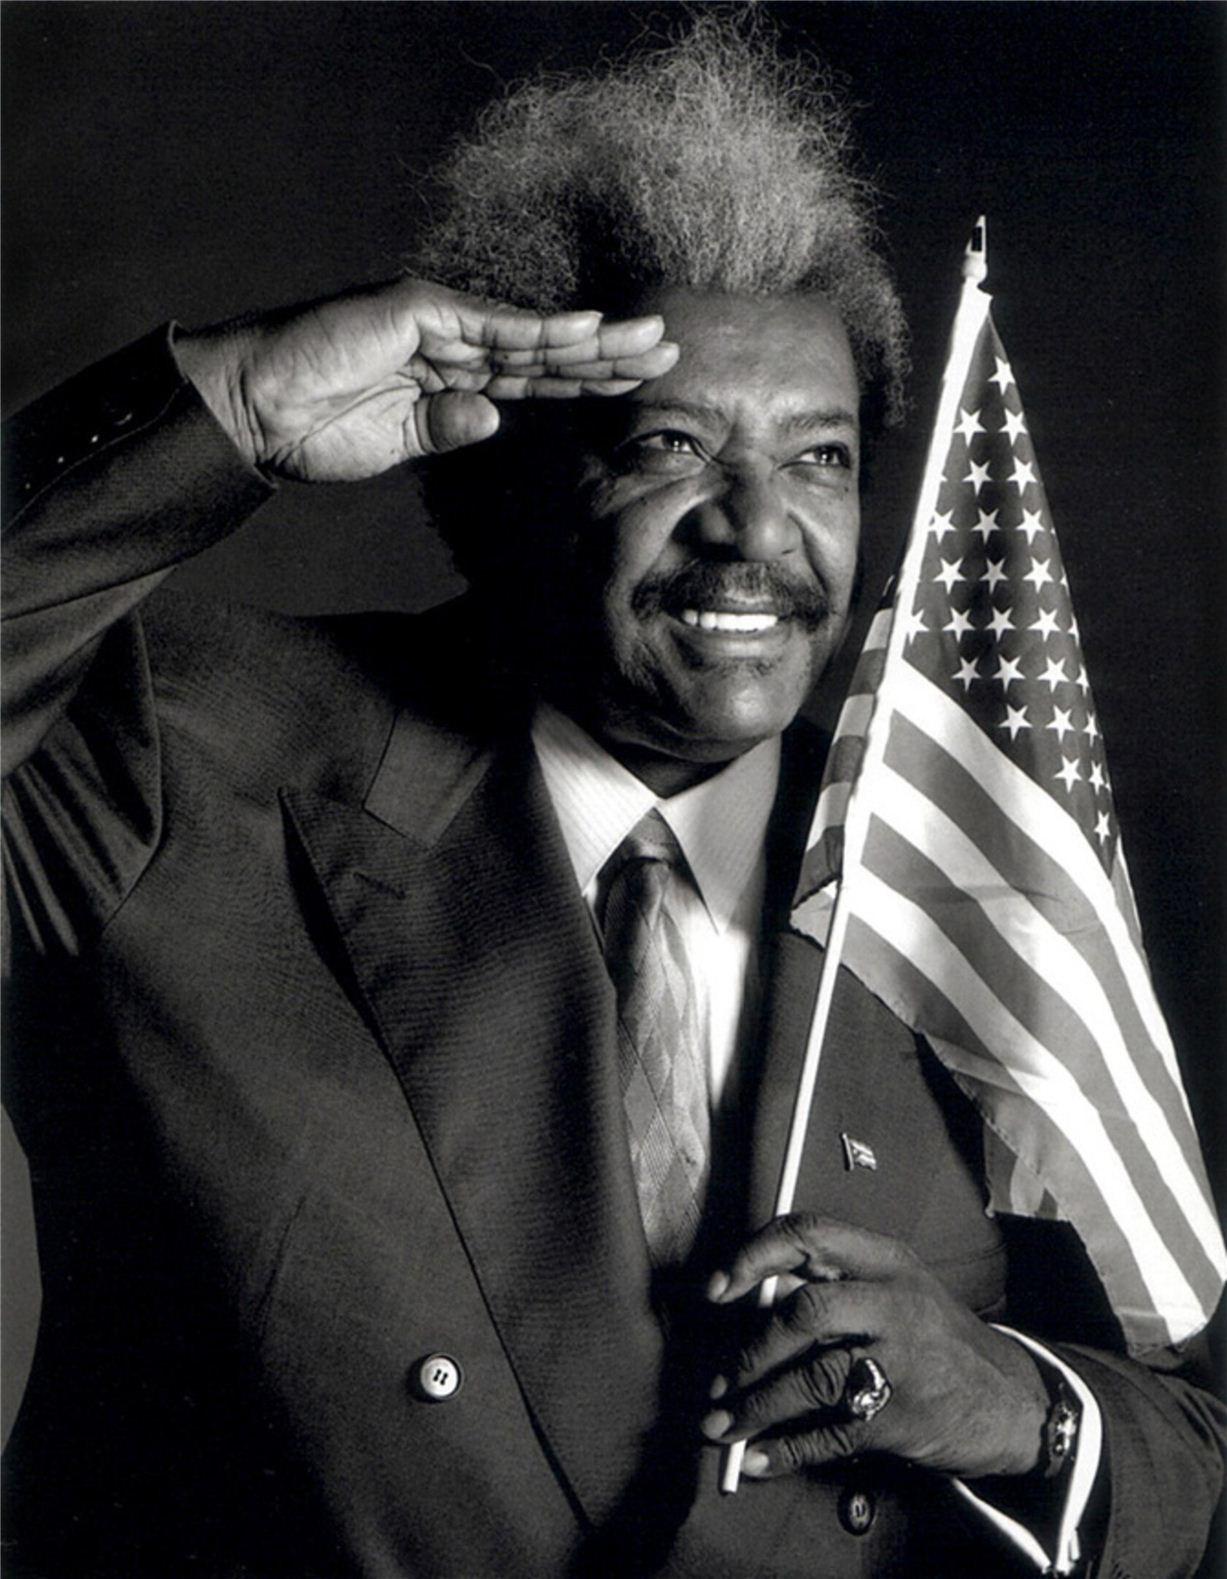 Don King / Дон Кинг - портрет фотографа Грега Гормана / Greg Gorman